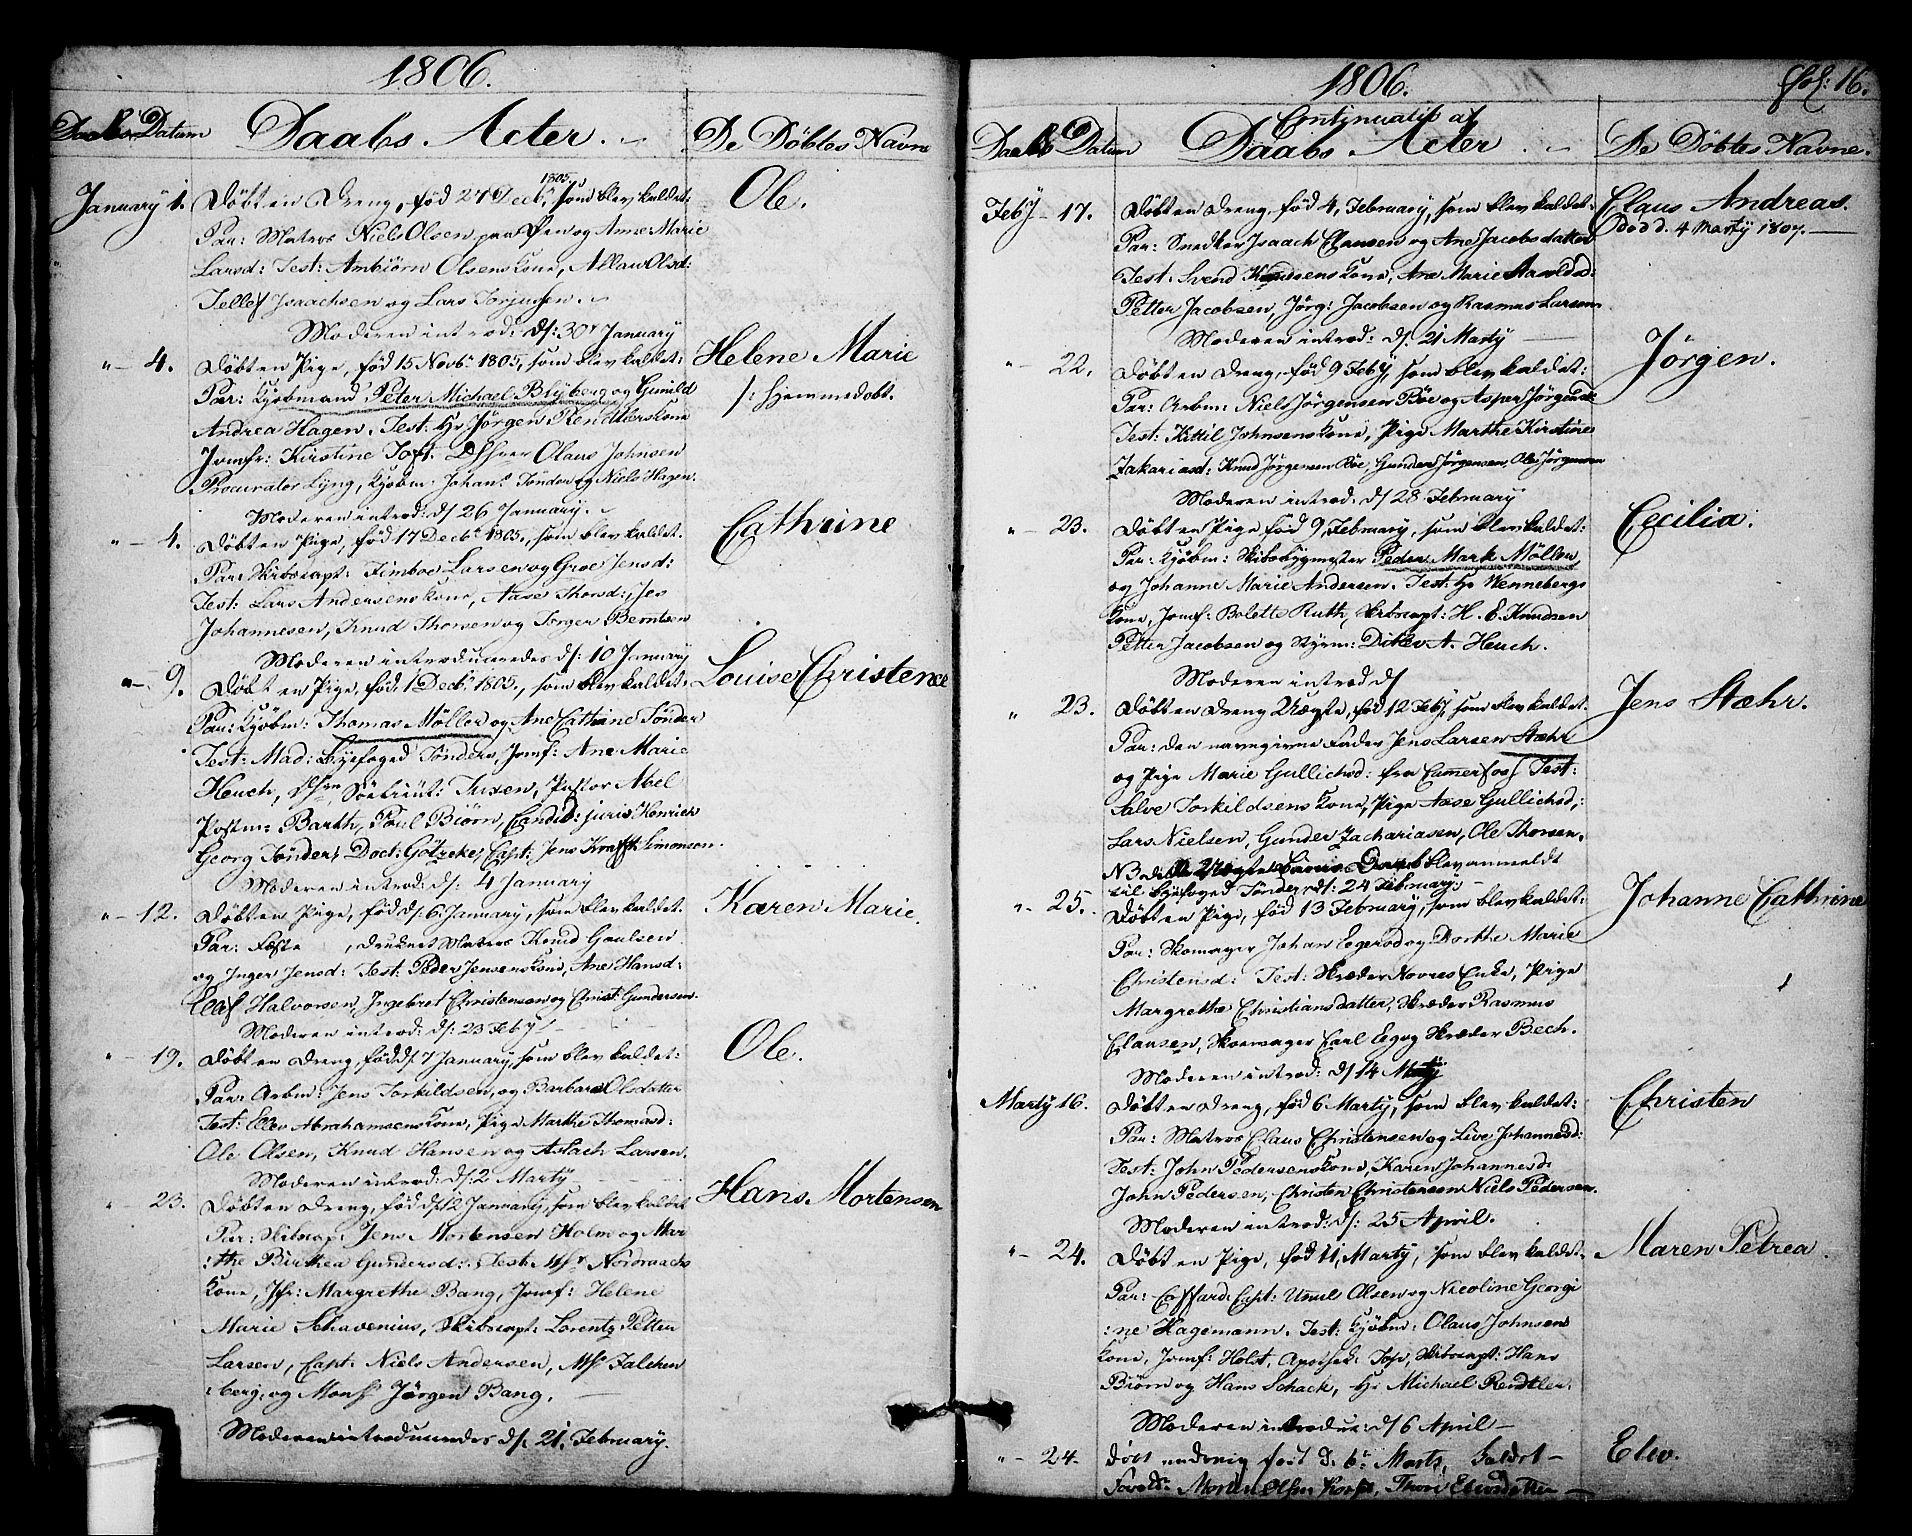 SAKO, Kragerø kirkebøker, F/Fa/L0003: Ministerialbok nr. 3, 1802-1813, s. 16